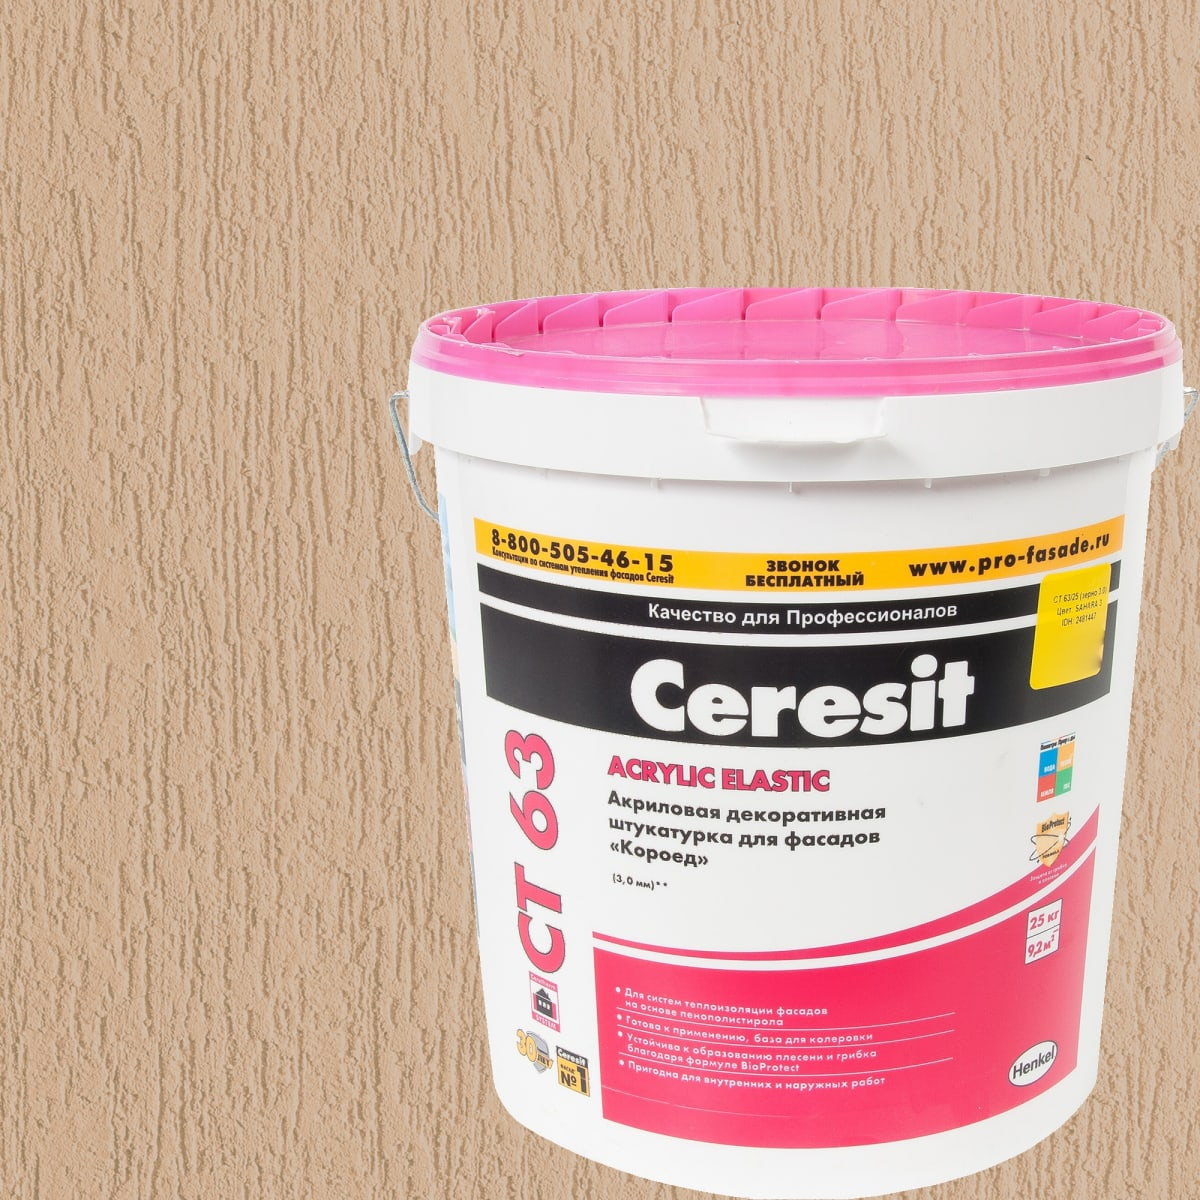 Штукатурка акриловая декоративная Ceresit CT 63 короед 2.0 25 кг